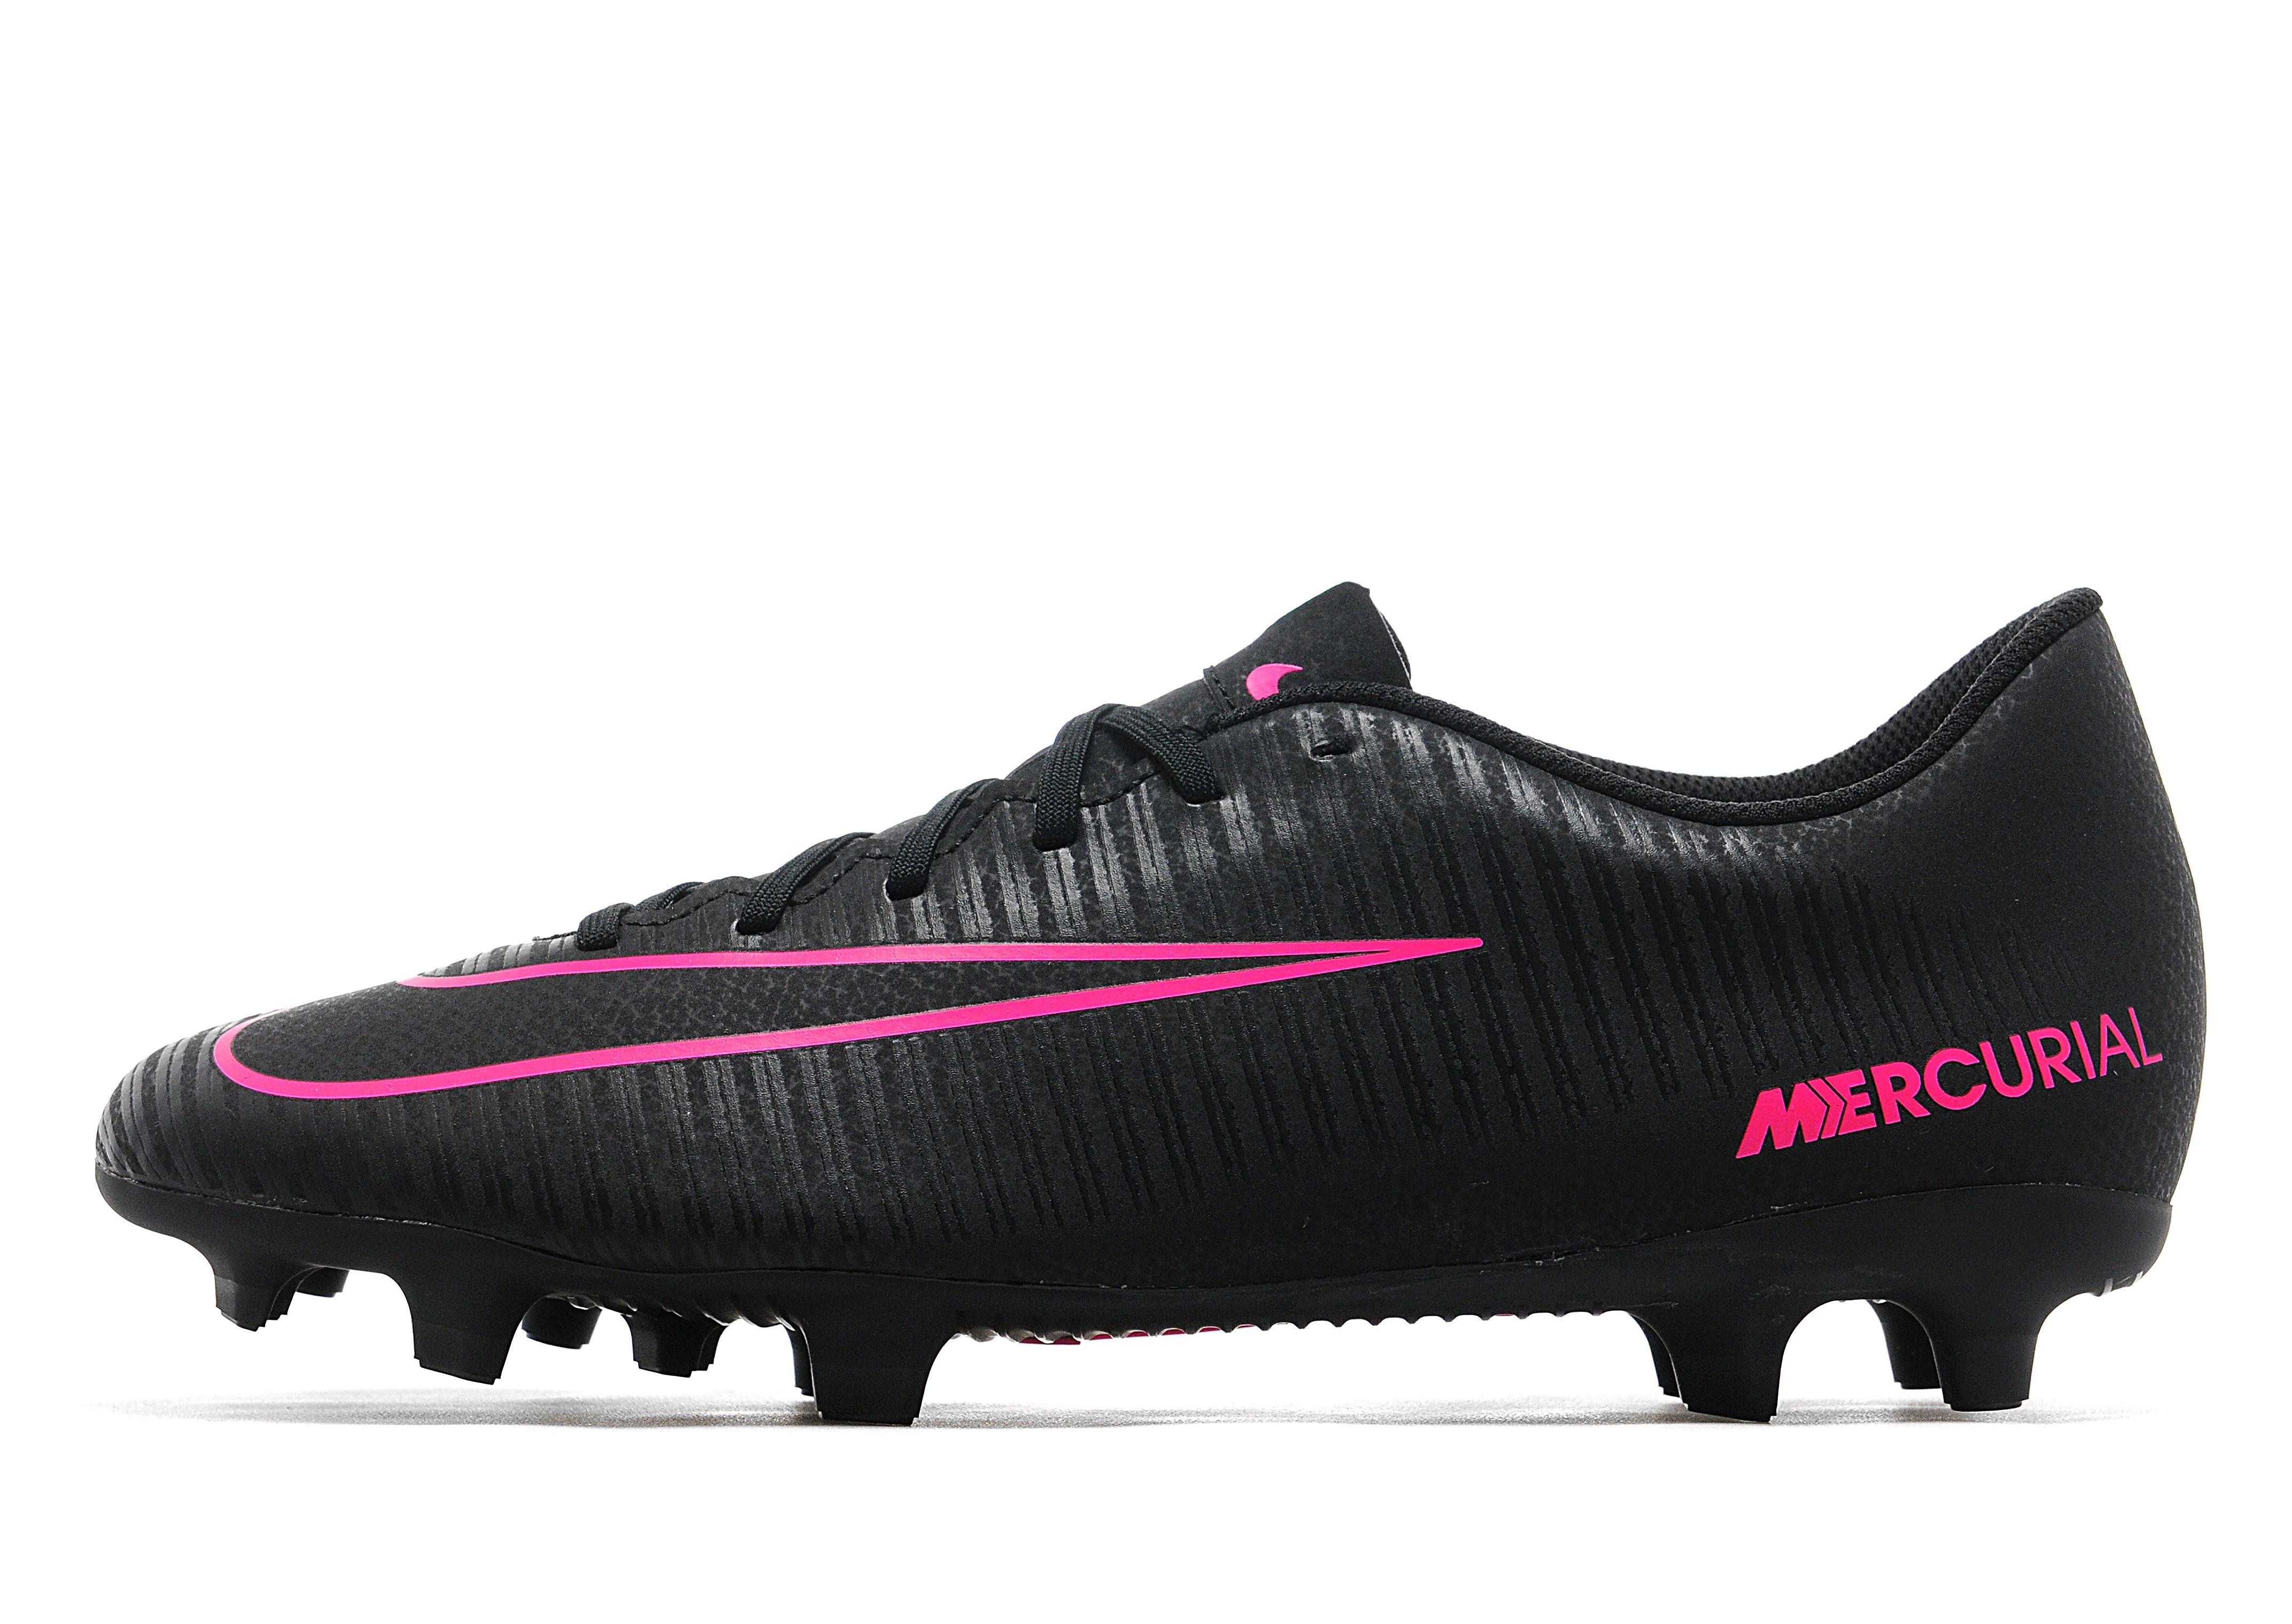 Nike Pitch Dark Mercurial Vortex III FG